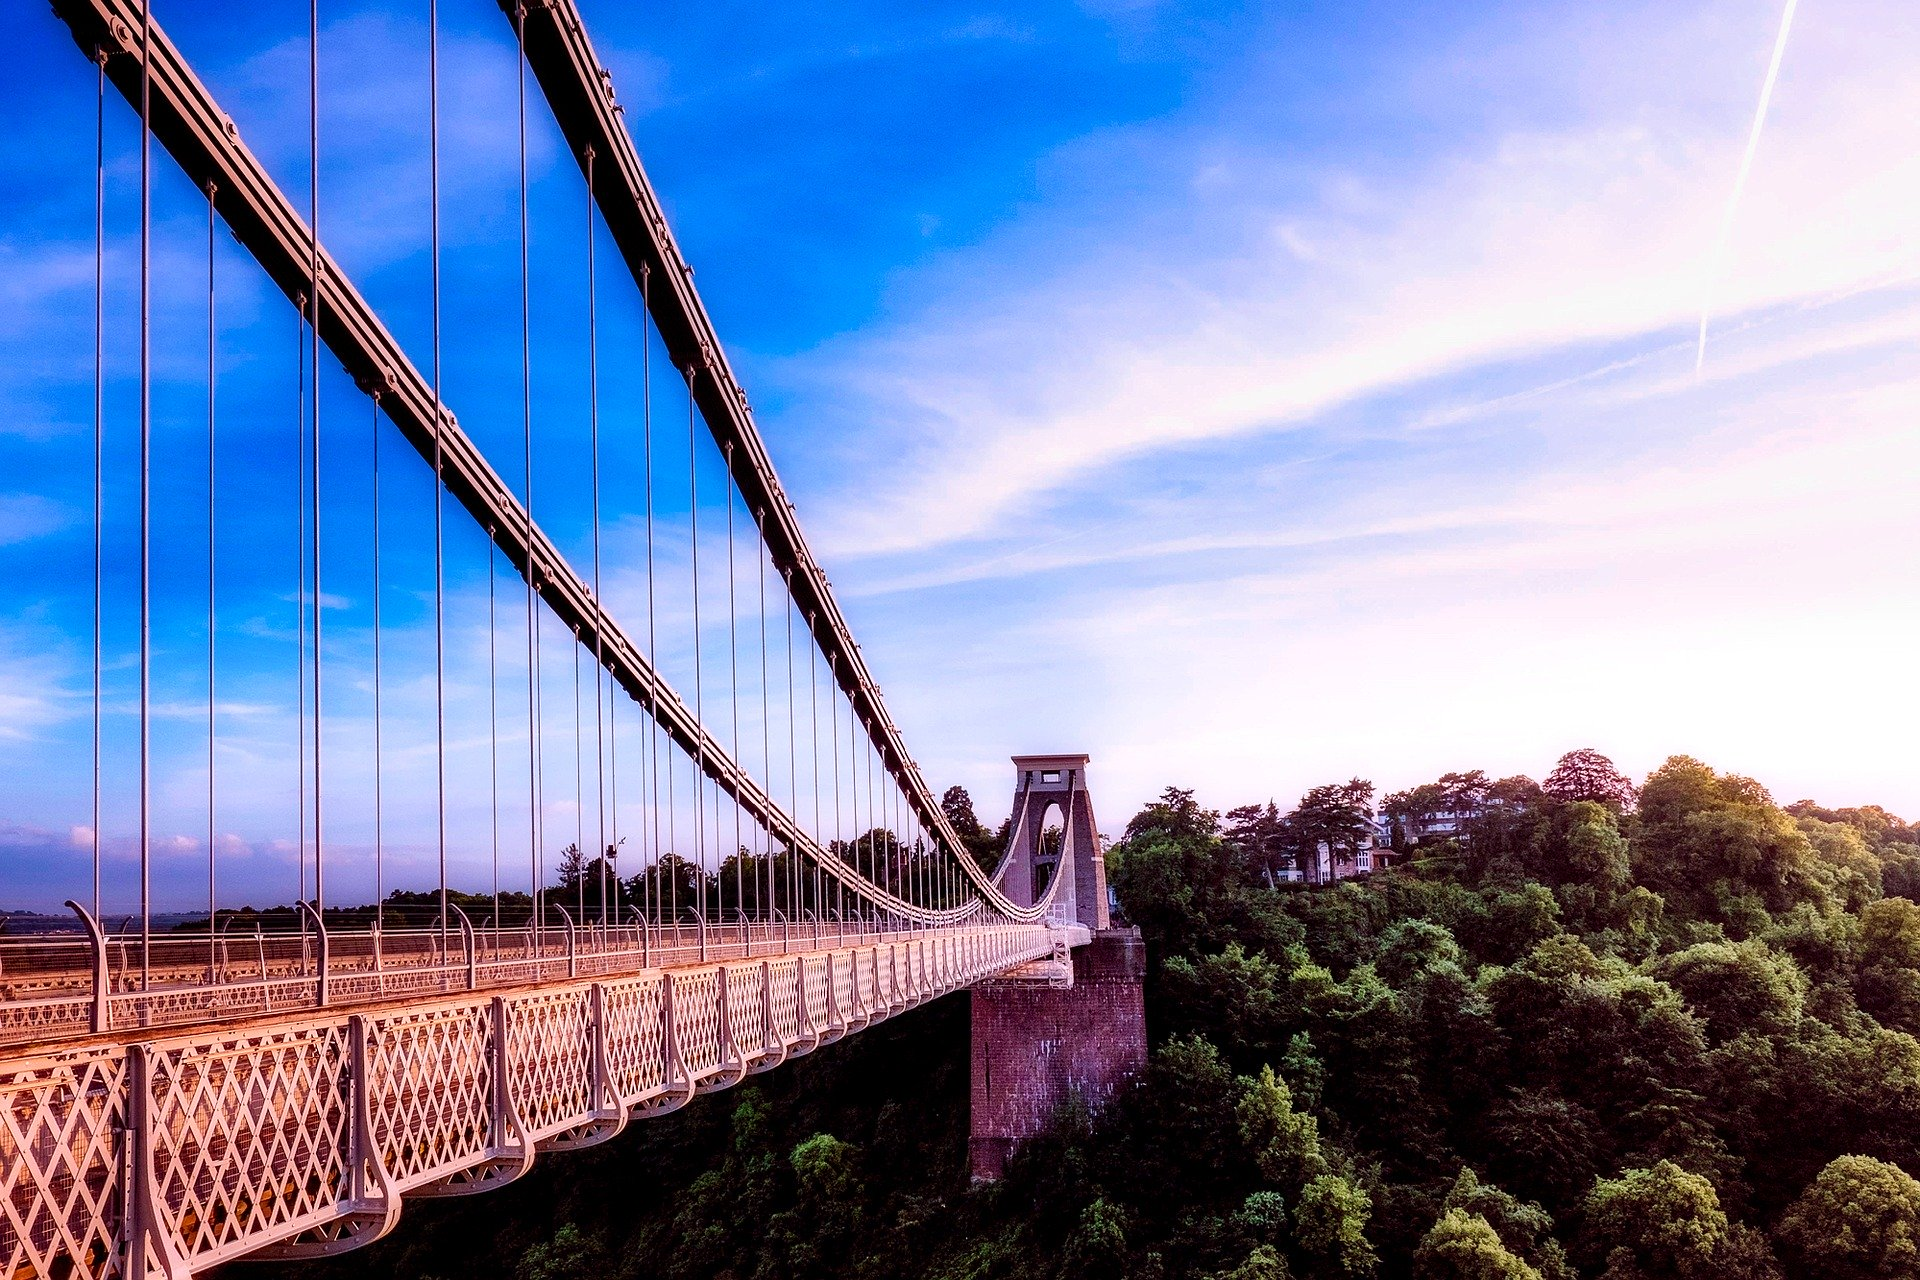 A picture of Clifton Suspension Bridge in Bristol, UK.